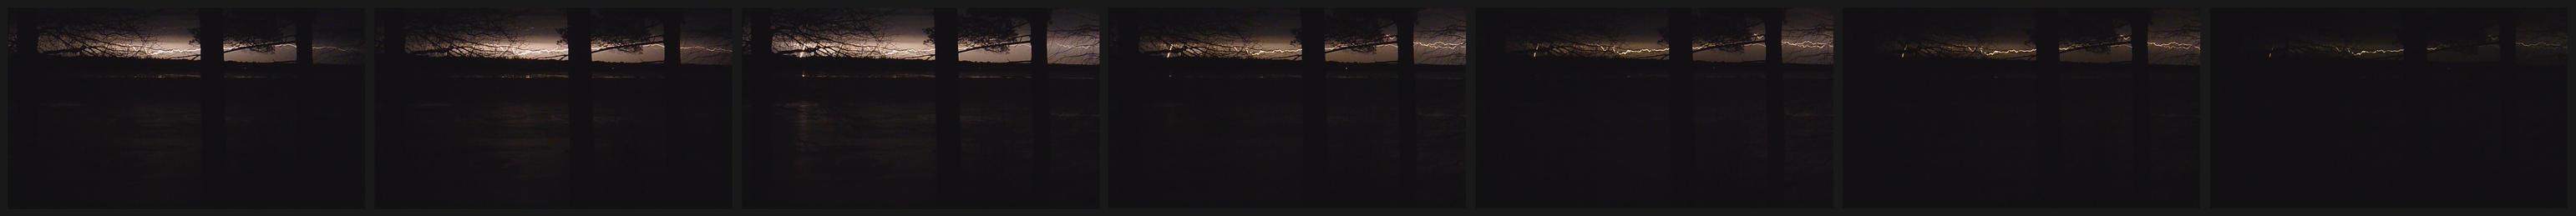 Lightning Filmstrip by dizzyflower28